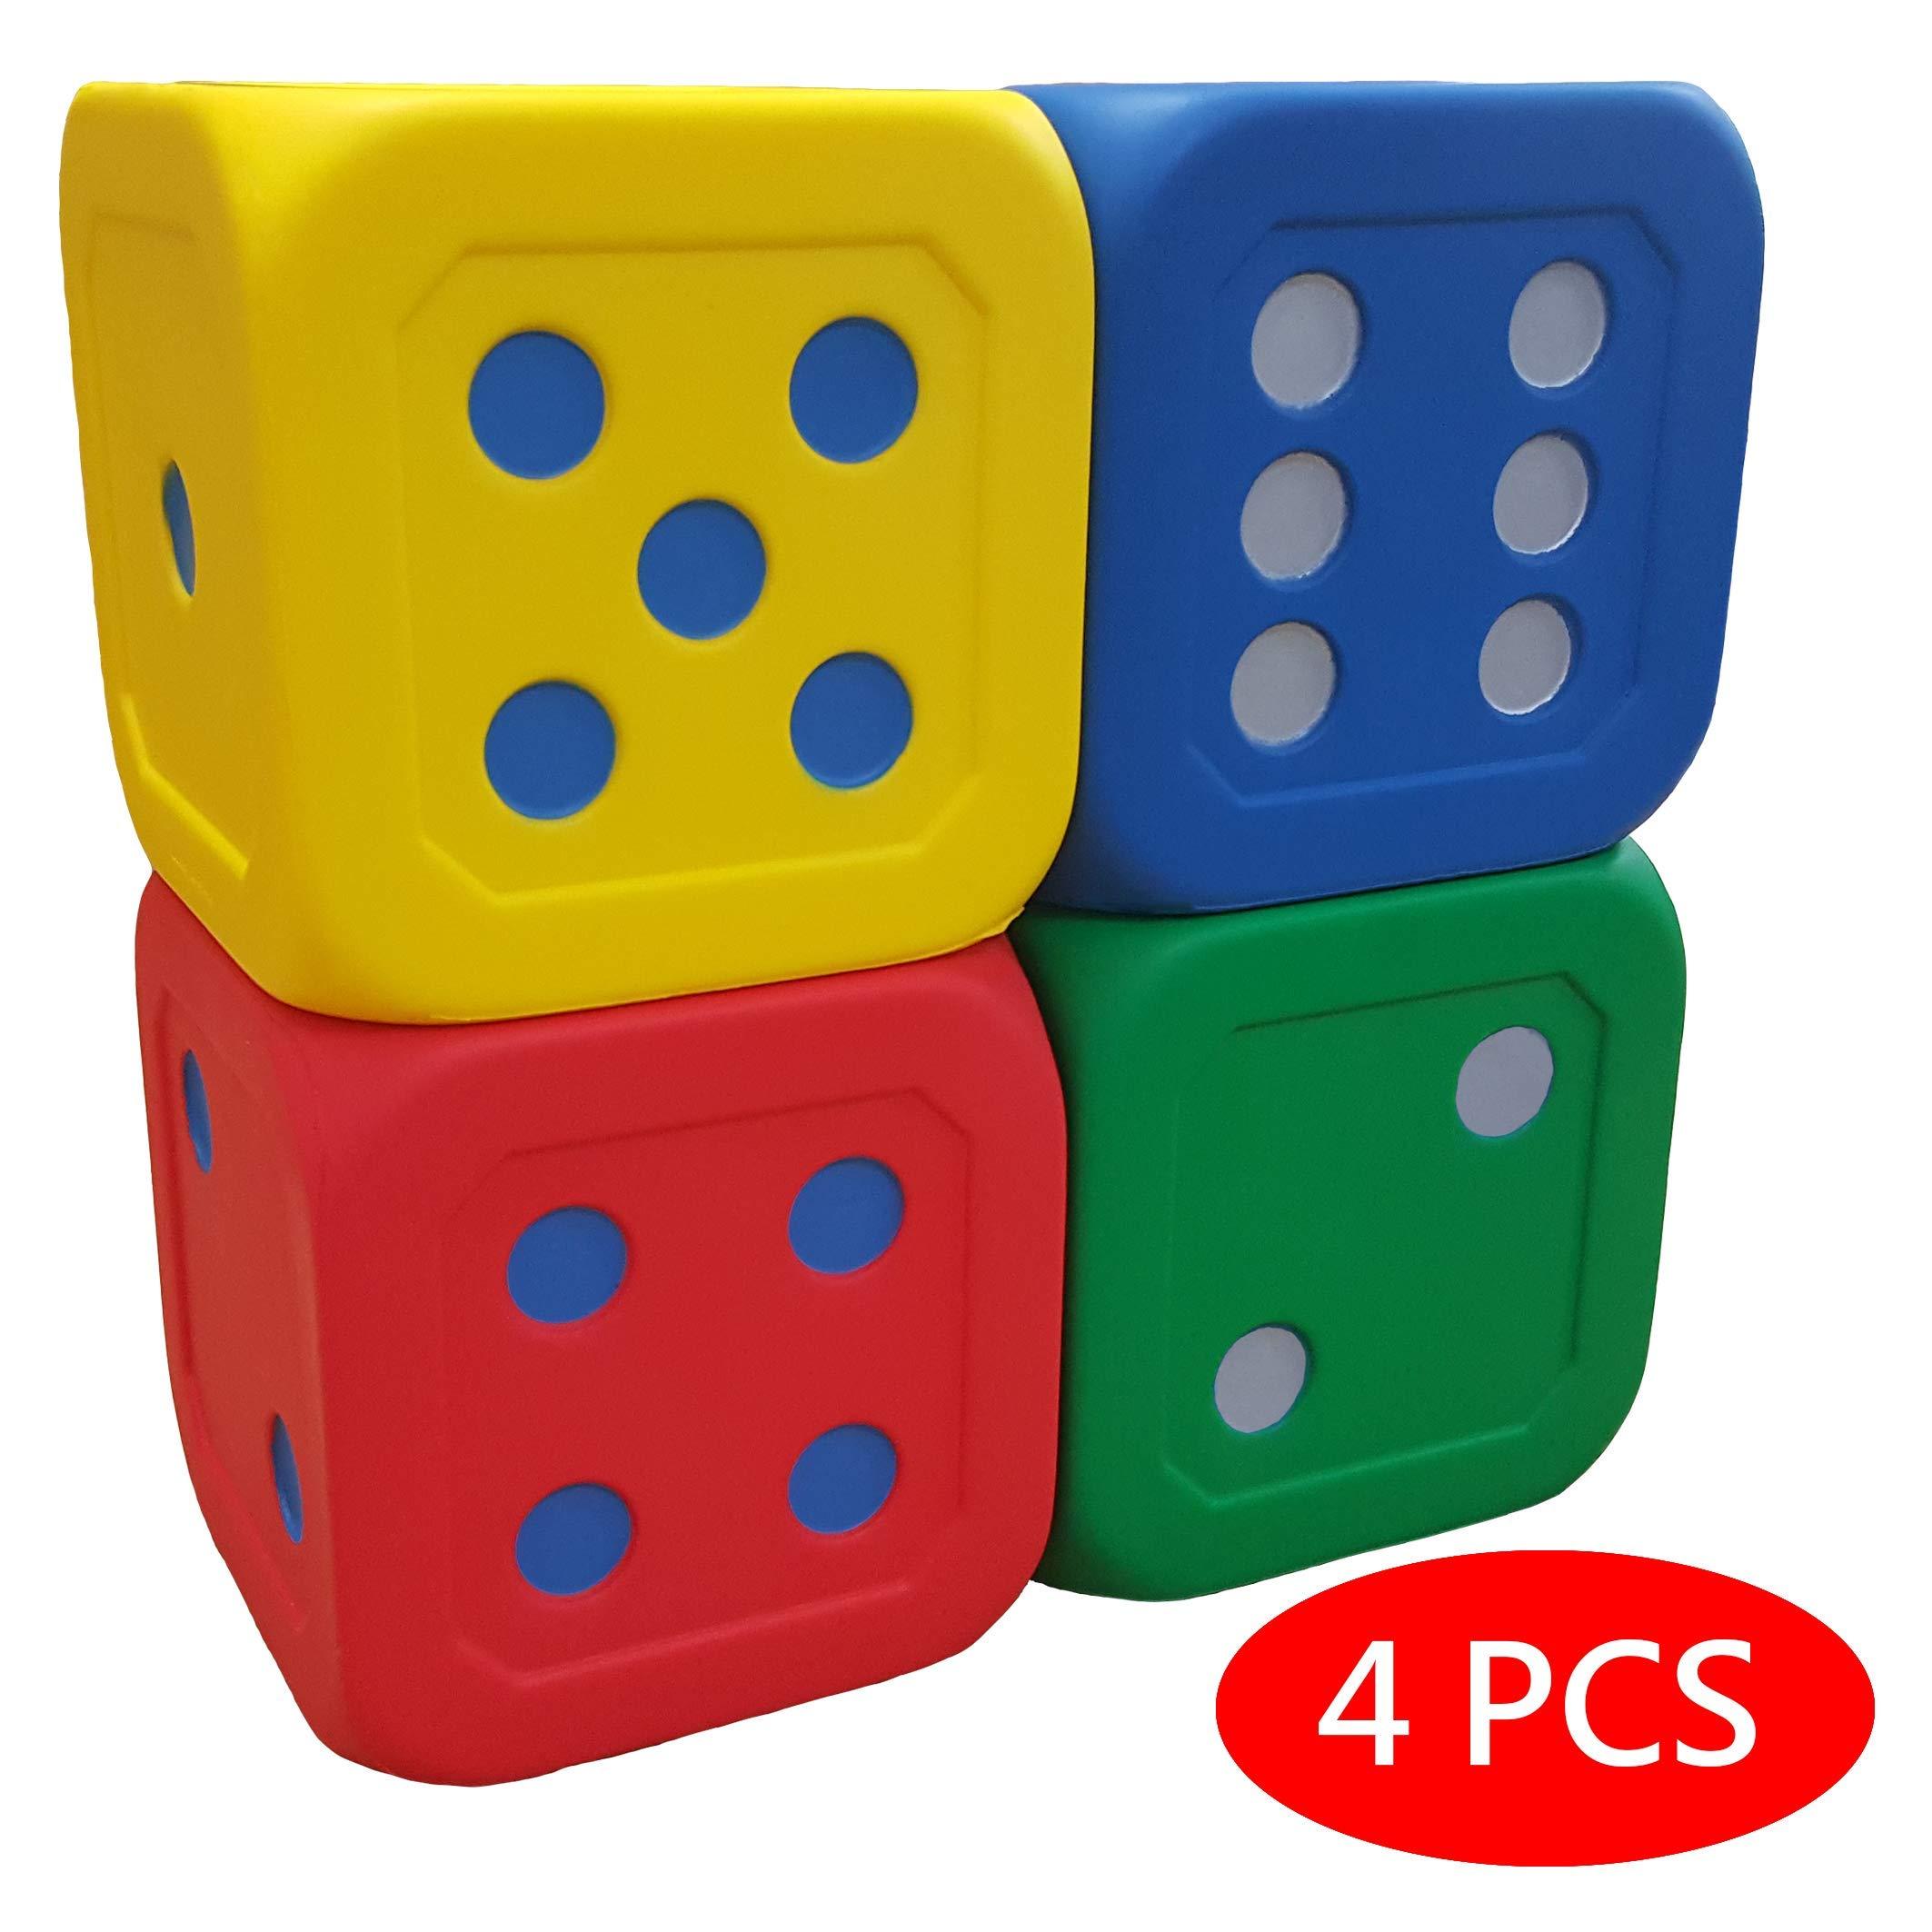 Macro Giant 6 Inch Soft Foam Jumbo Big Playing Dice, Set of 4, Red + Blue + Yellow + Green, Math Teaching, Teaching Aids, Board Games, Kid Toy